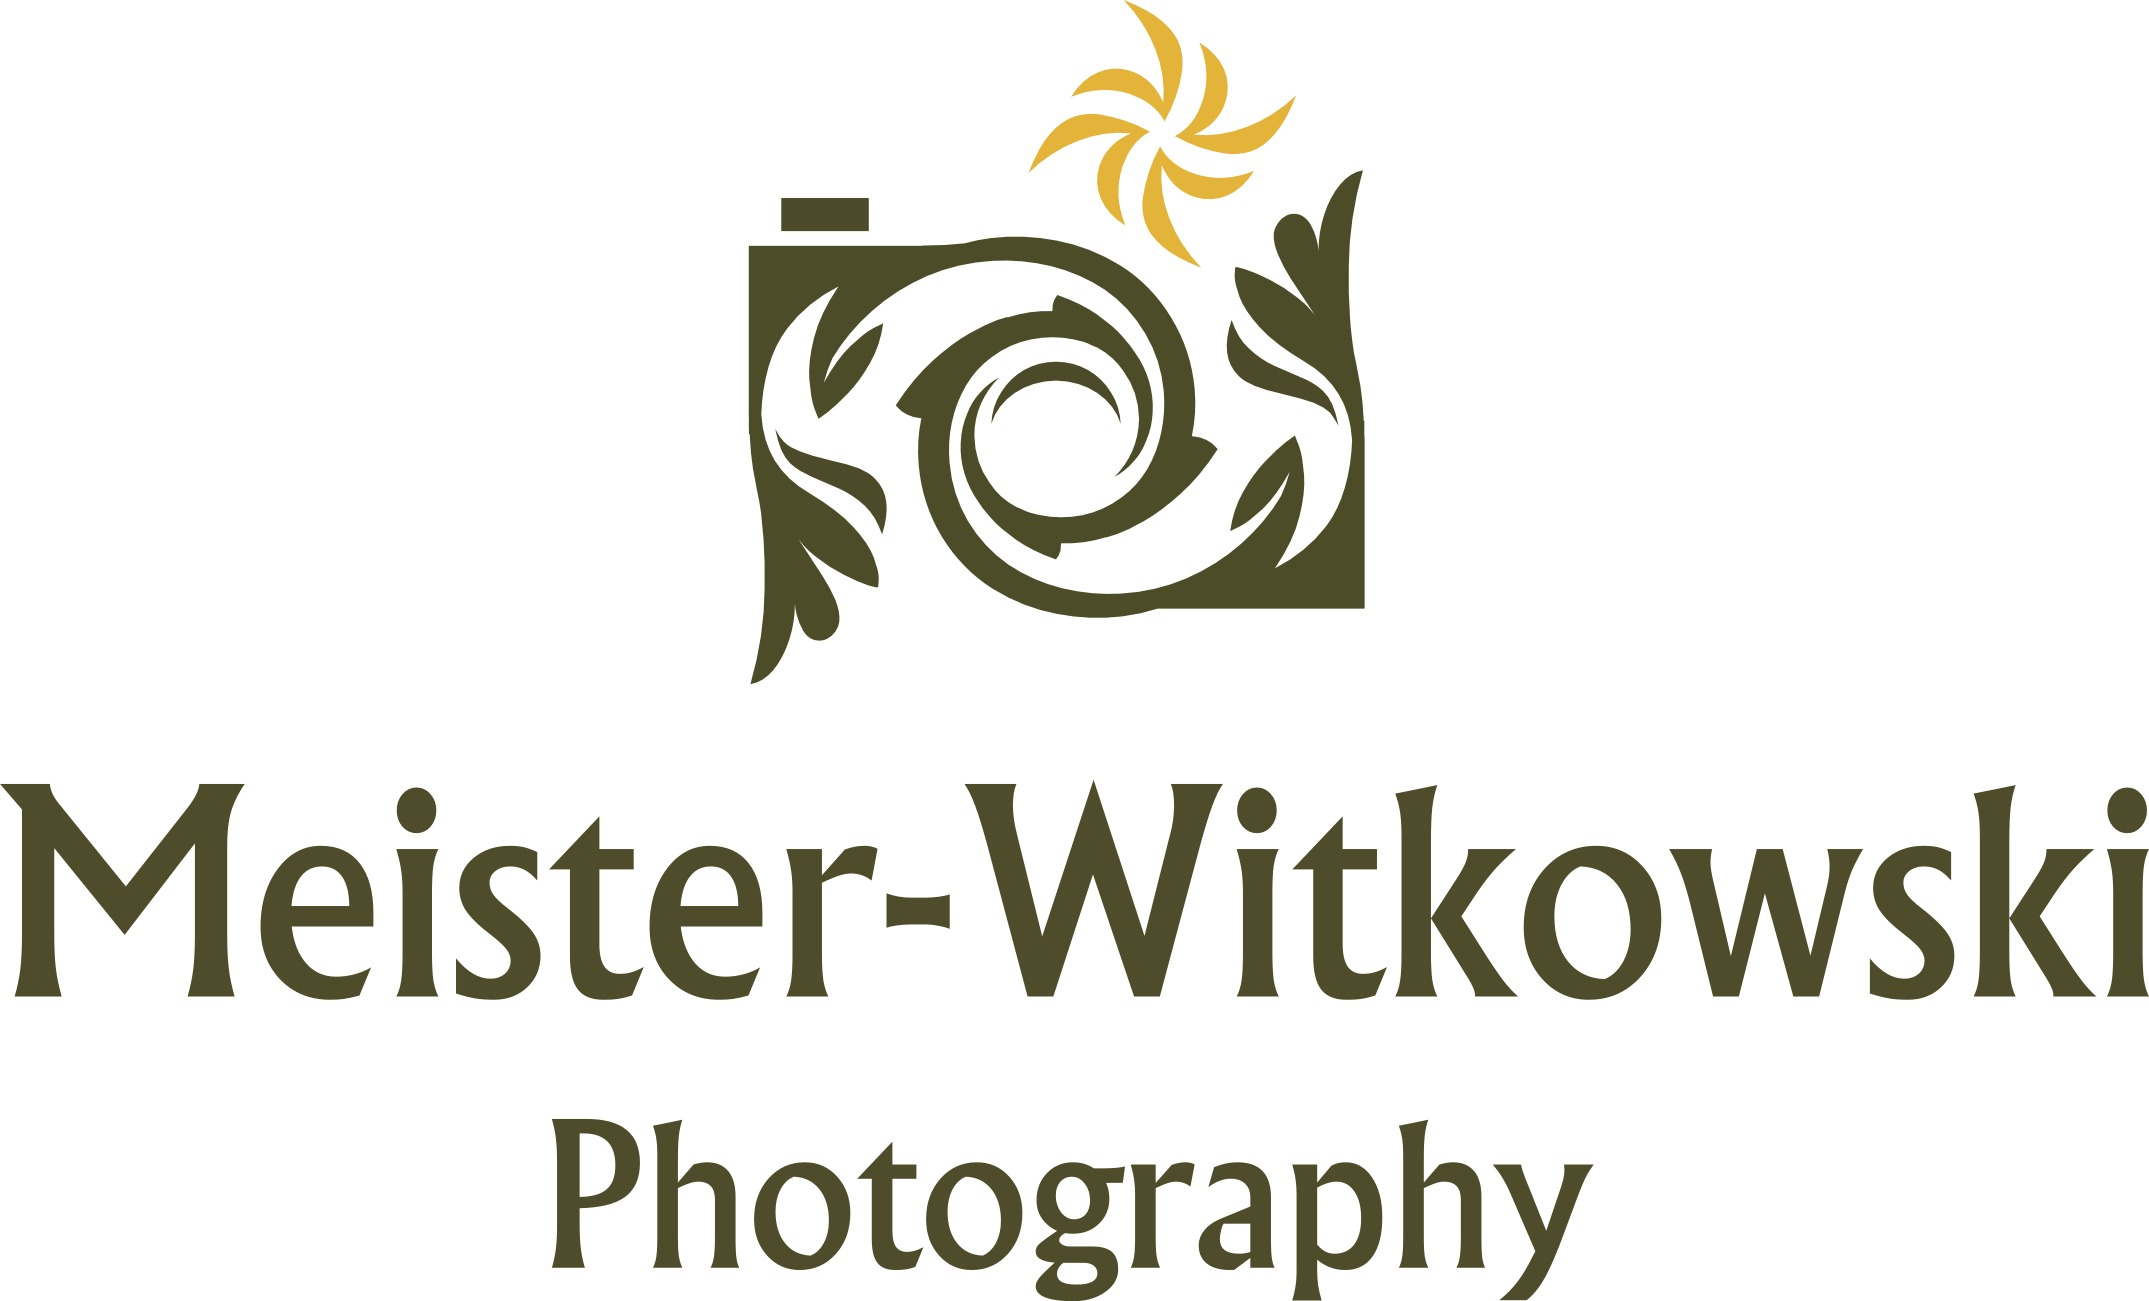 BH Meister-Witkowski Photograpy.jpg